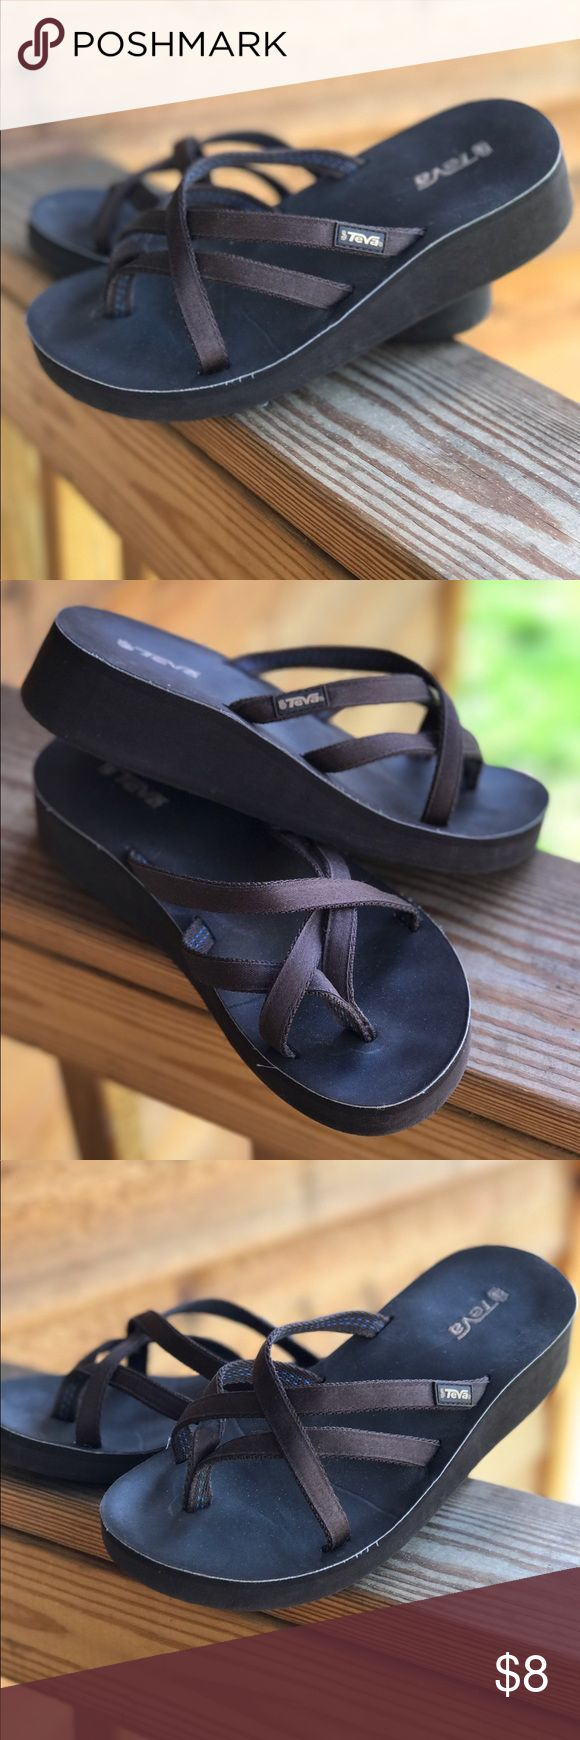 🌺Teva Flip Flops Size 7W 🌺 Super comfortable brown wedge heel flip flops size 7W Teva Shoes Wedges